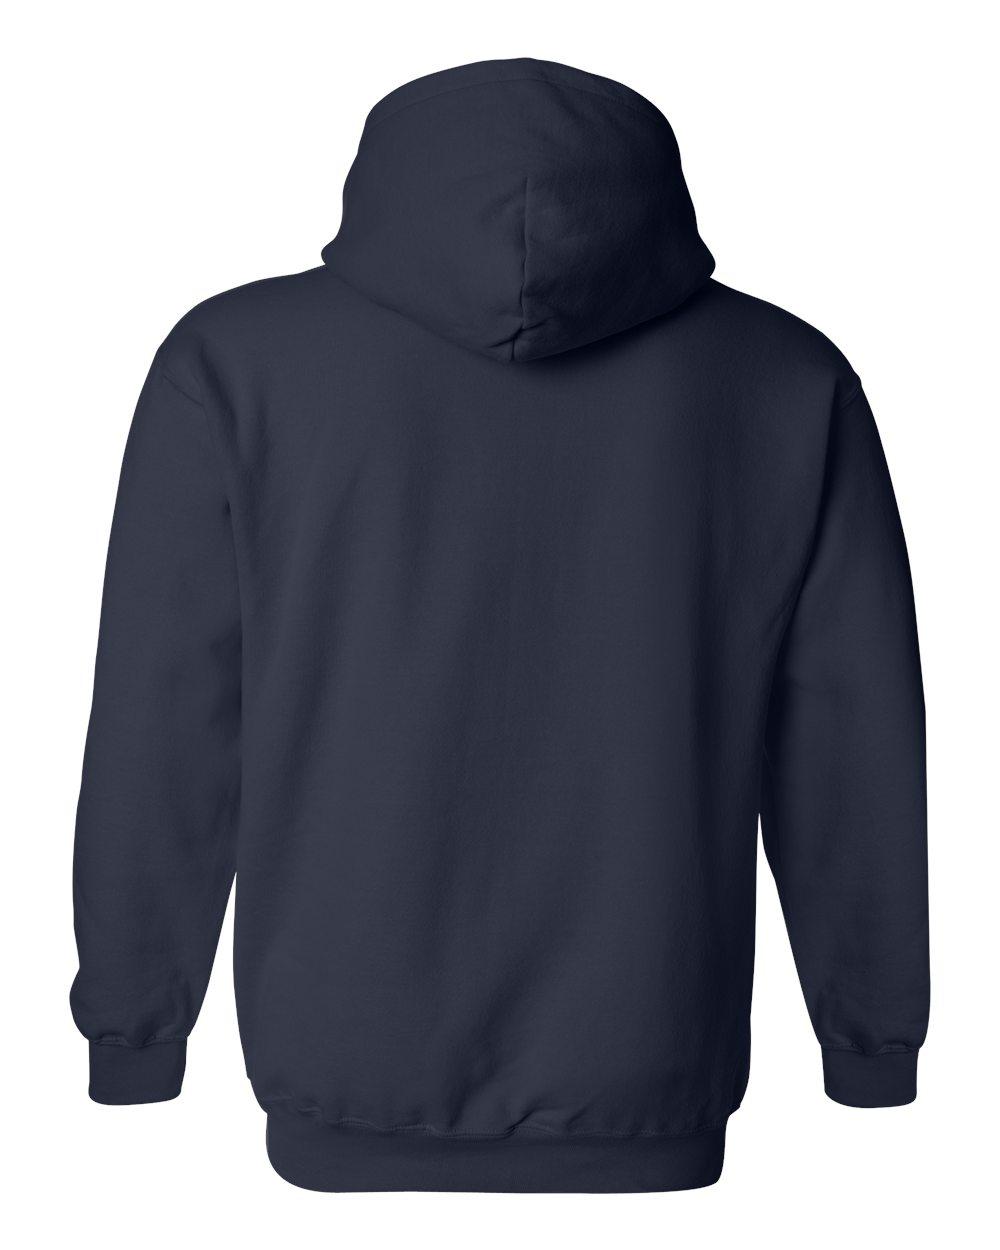 Gildan-Mens-Blank-Hoodie-Heavy-Blend-Hooded-Sweatshirt-Solid-18500-up-to-5XL thumbnail 66